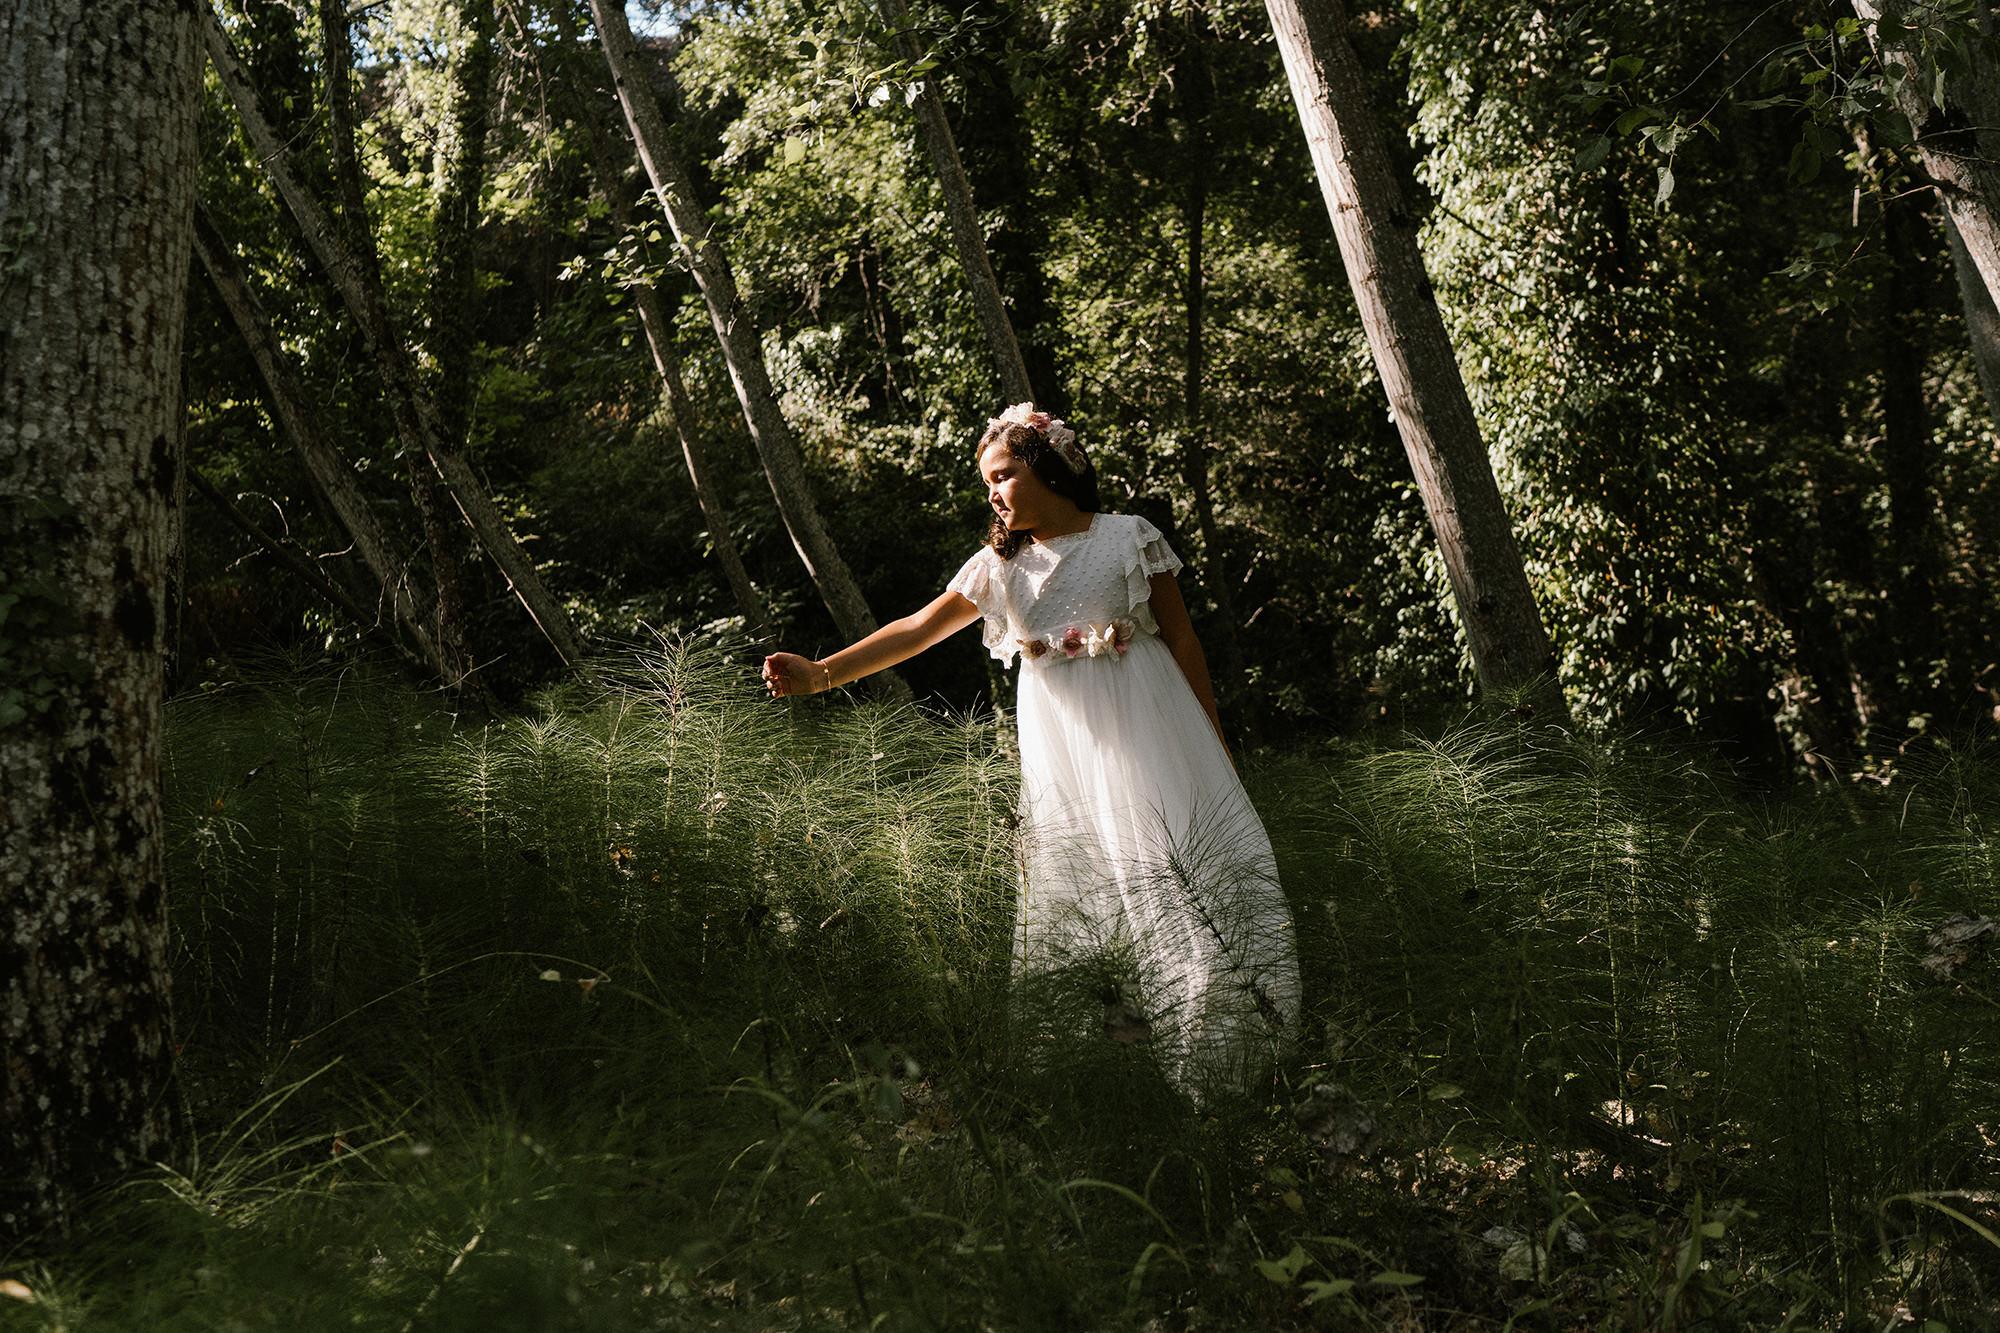 Fotógrafo de comunión en la Sierra de Huelva